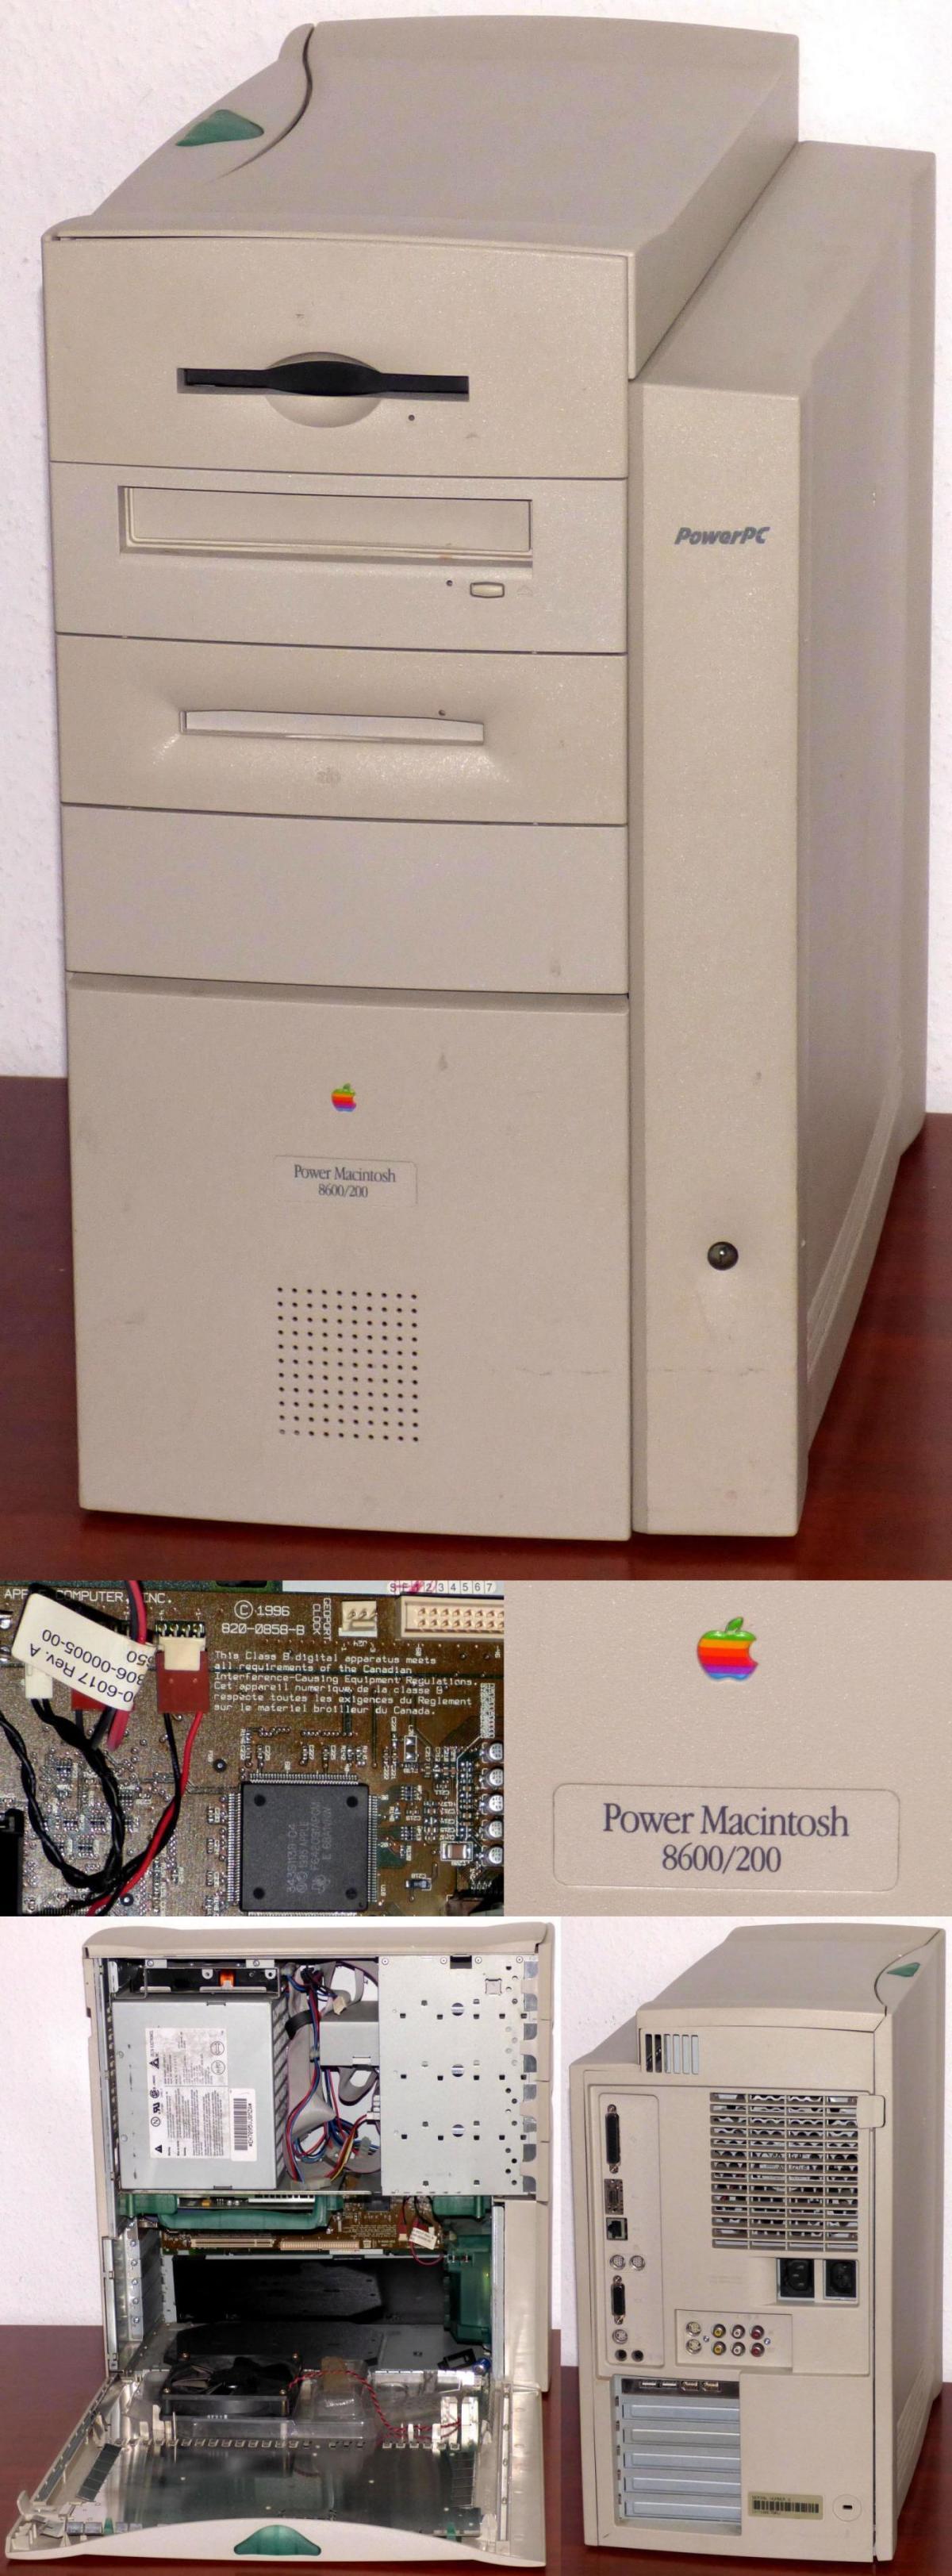 apple macintosh imac g3 emac powermac retro pcs. Black Bedroom Furniture Sets. Home Design Ideas